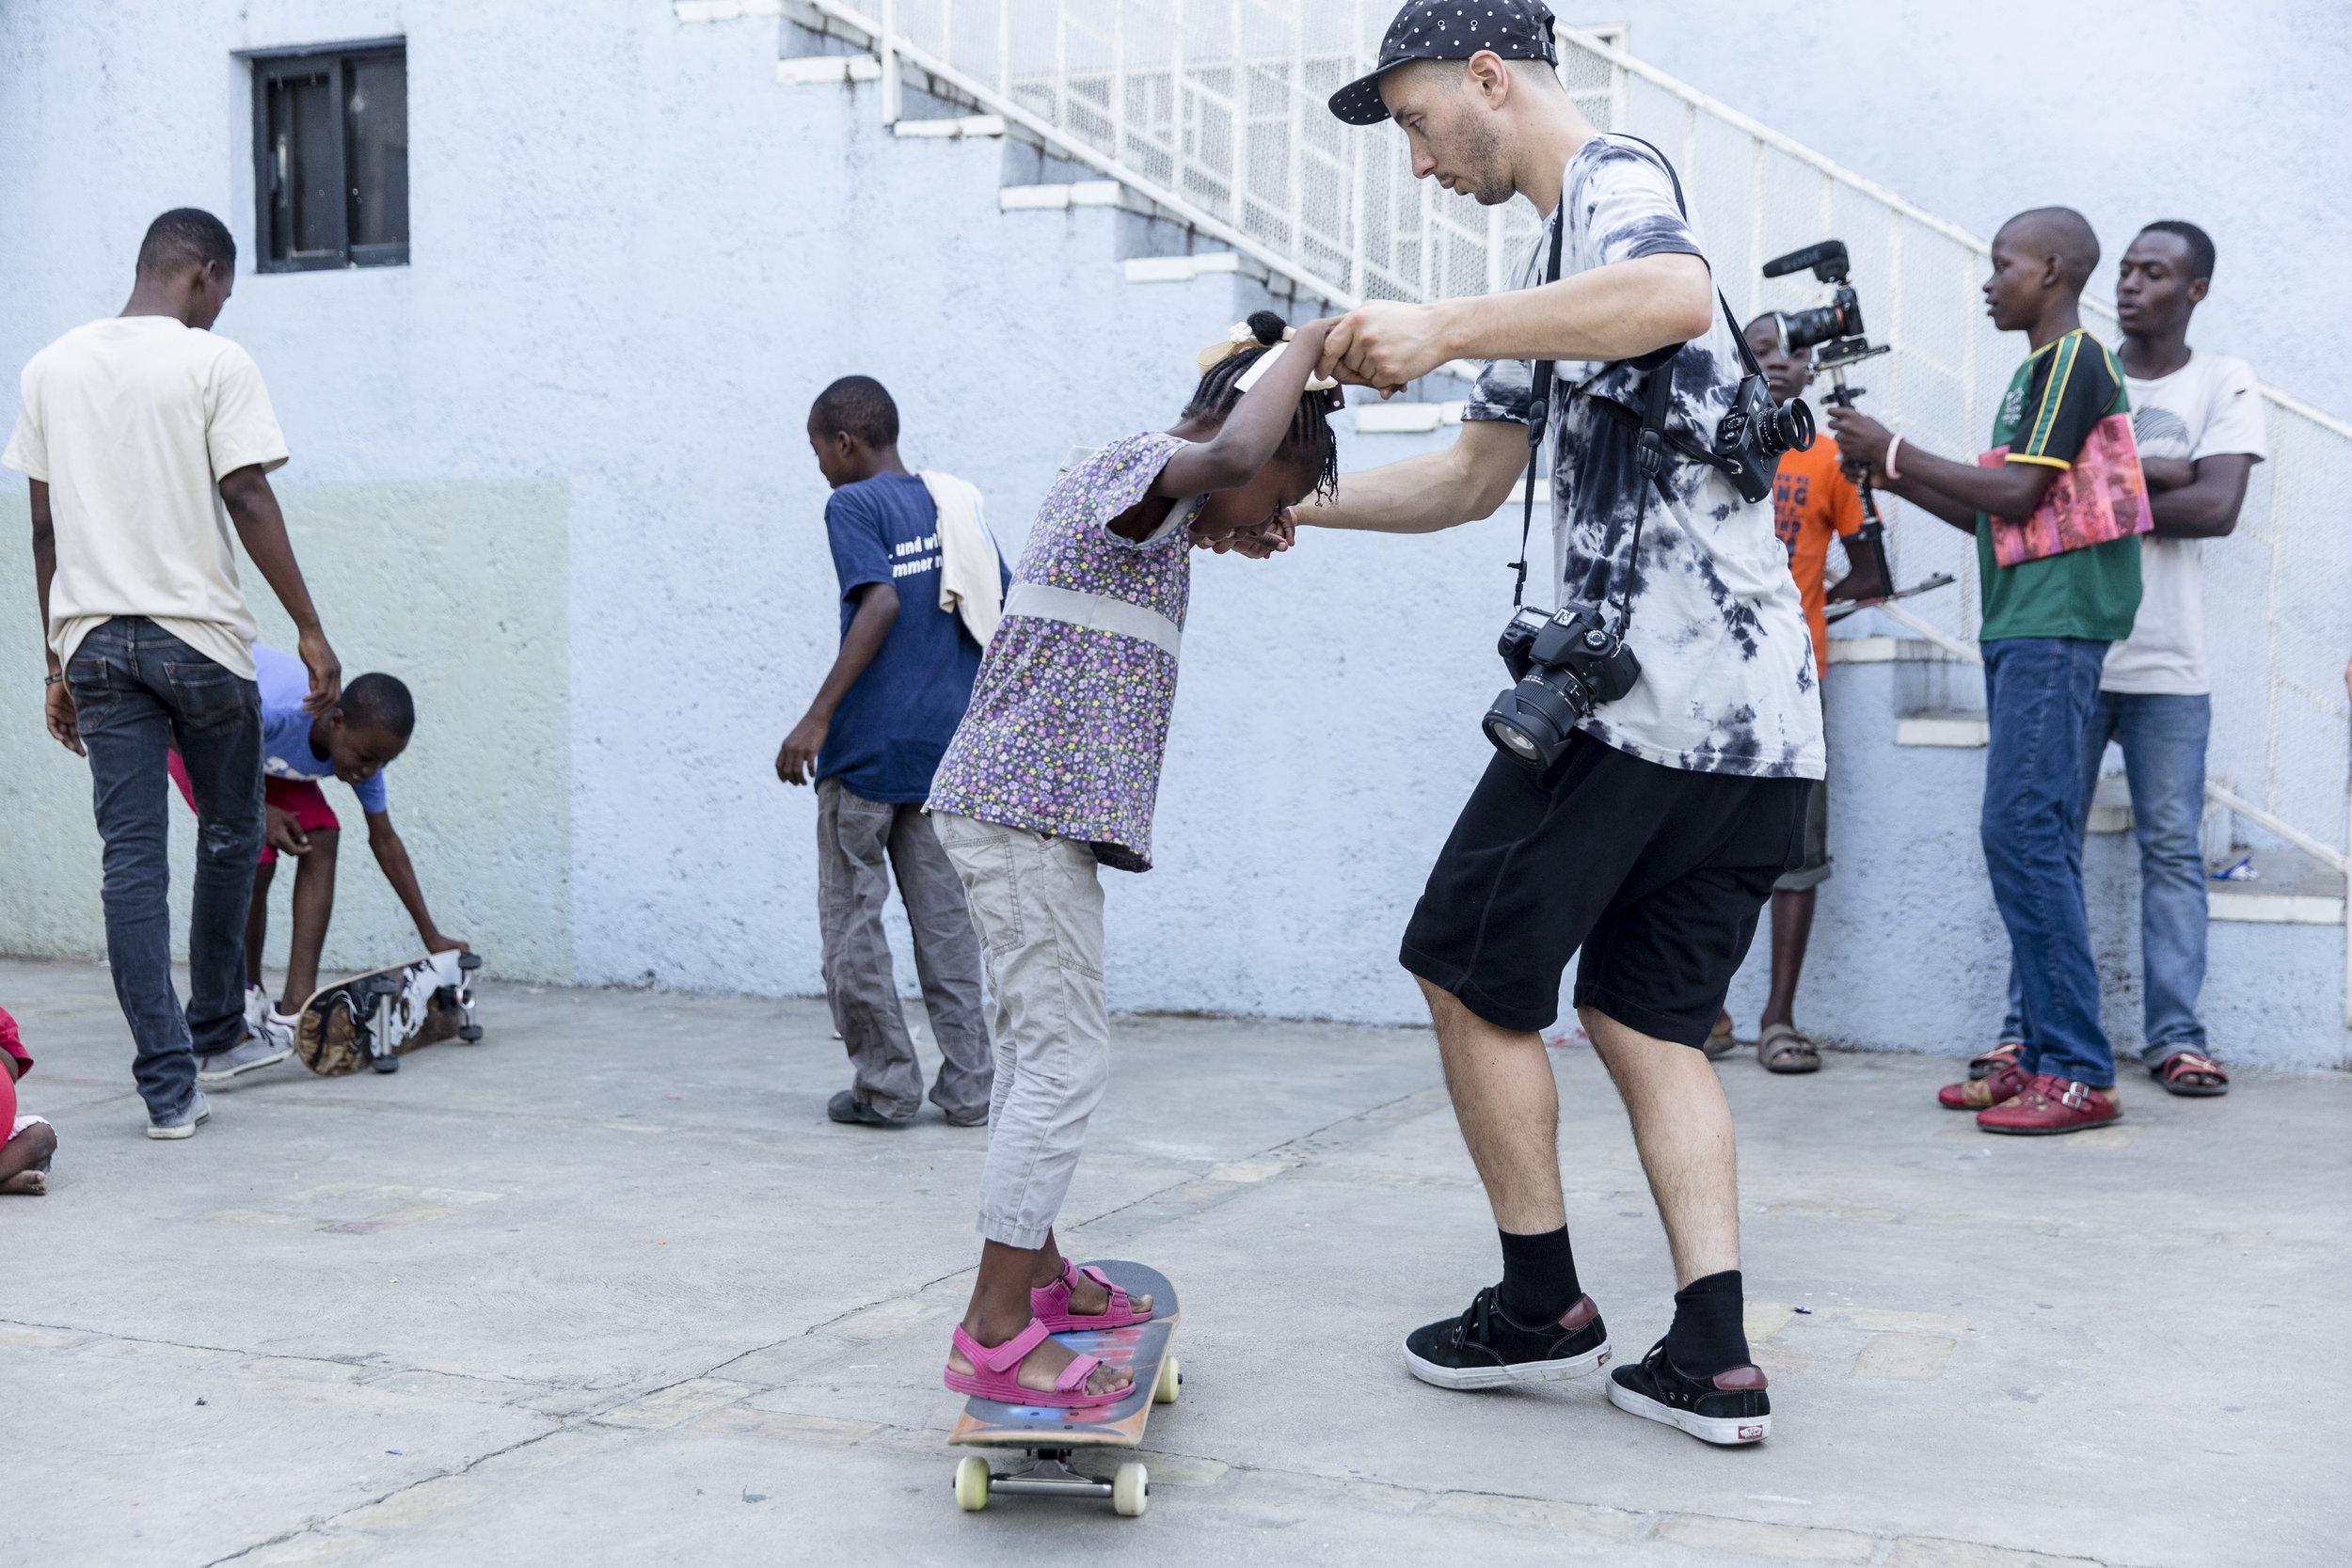 Amigo media specialist Chris Miller putting down the cameras for an impromtu skateboard lesson.  Photo: Matt Roy .